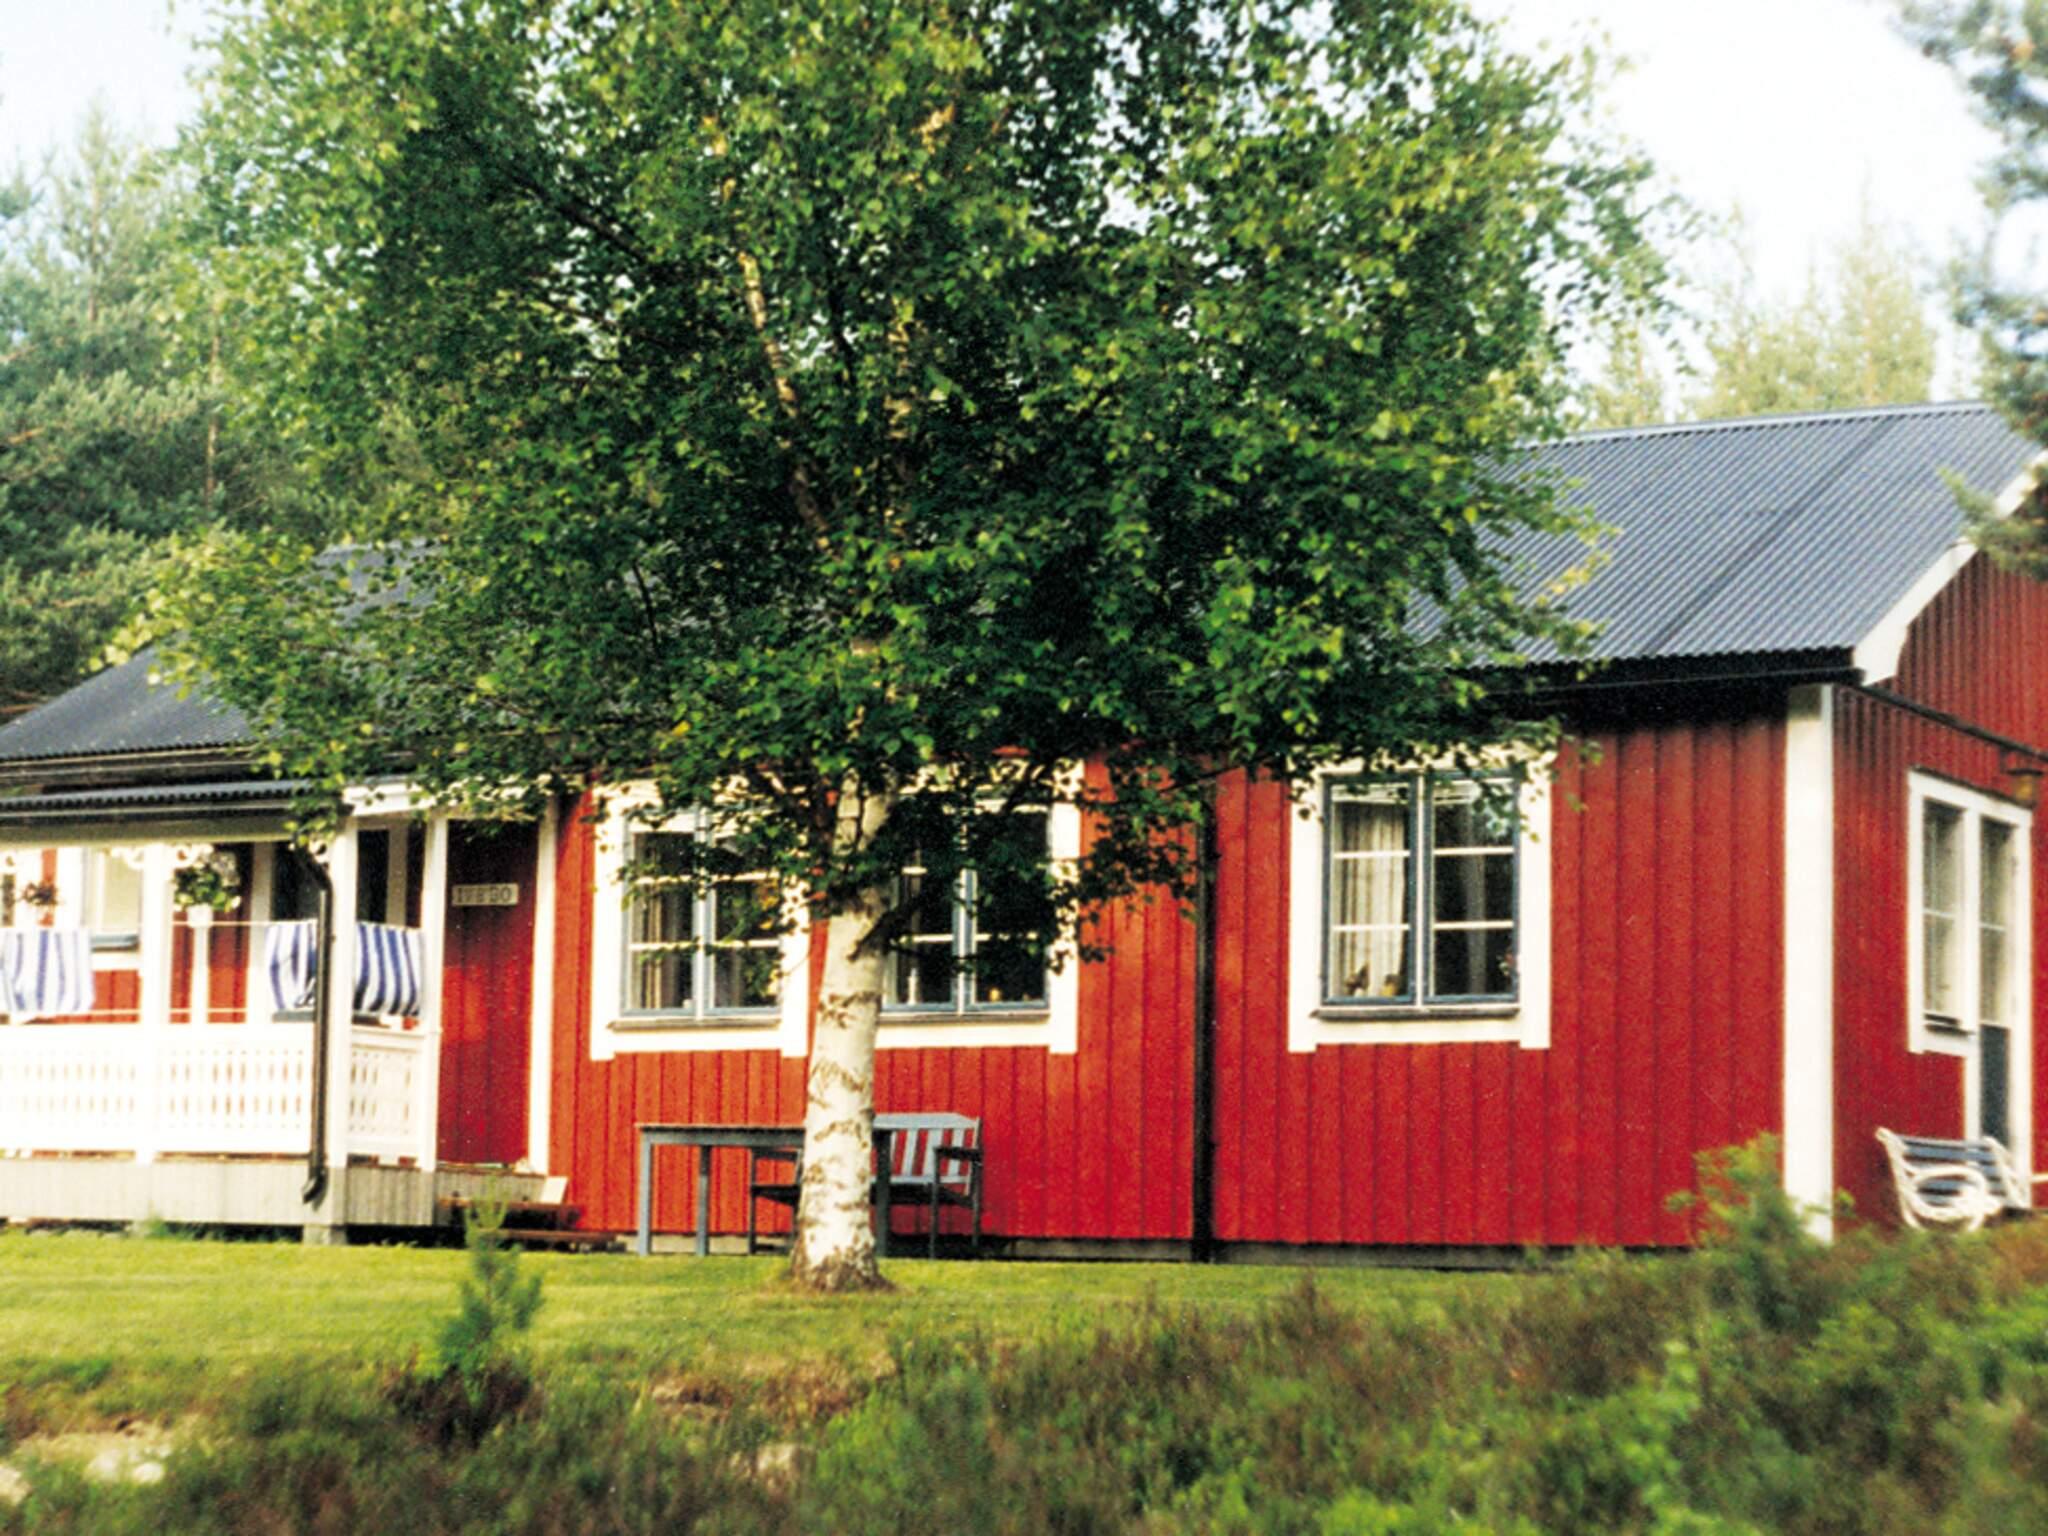 Ferienhaus Ivebo (87165), Östmark, Värmlands län, Mittelschweden, Schweden, Bild 1